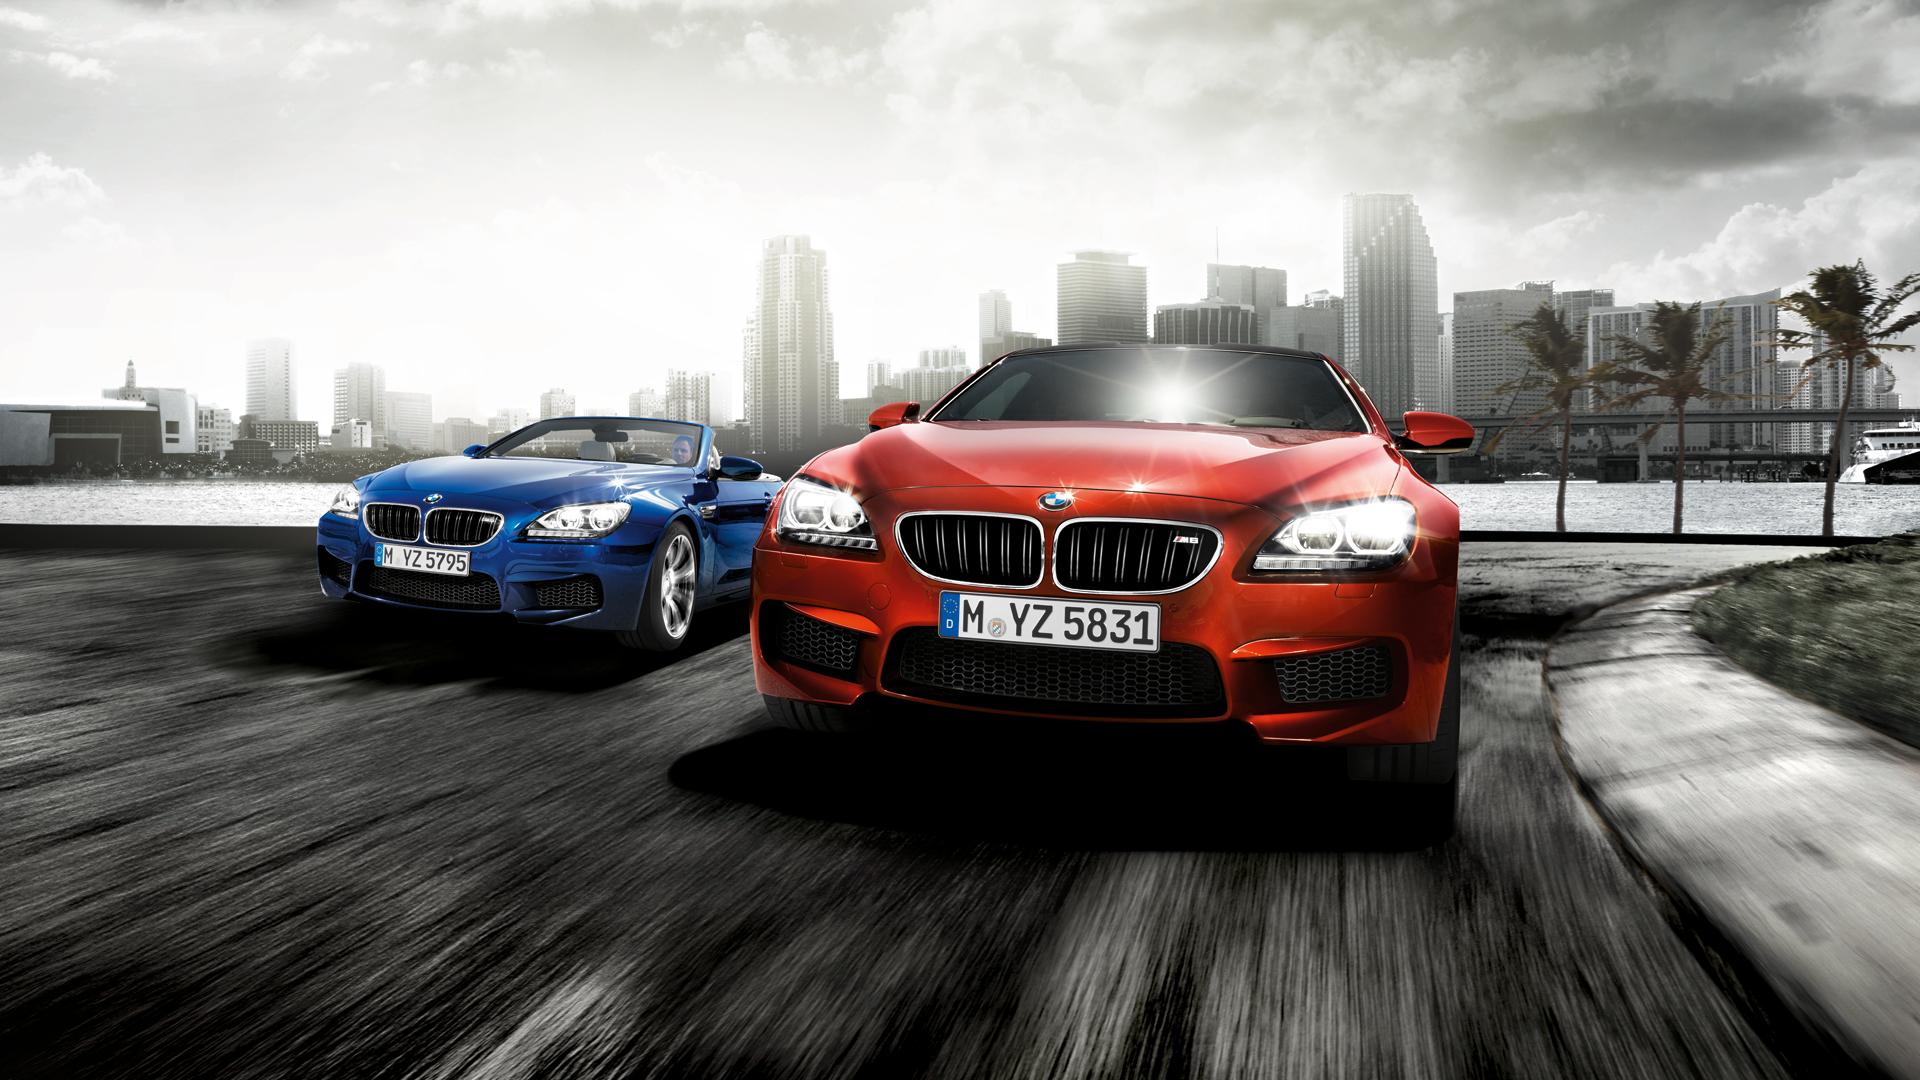 BMW M6 Wallpaper HD - WallpaperSafari